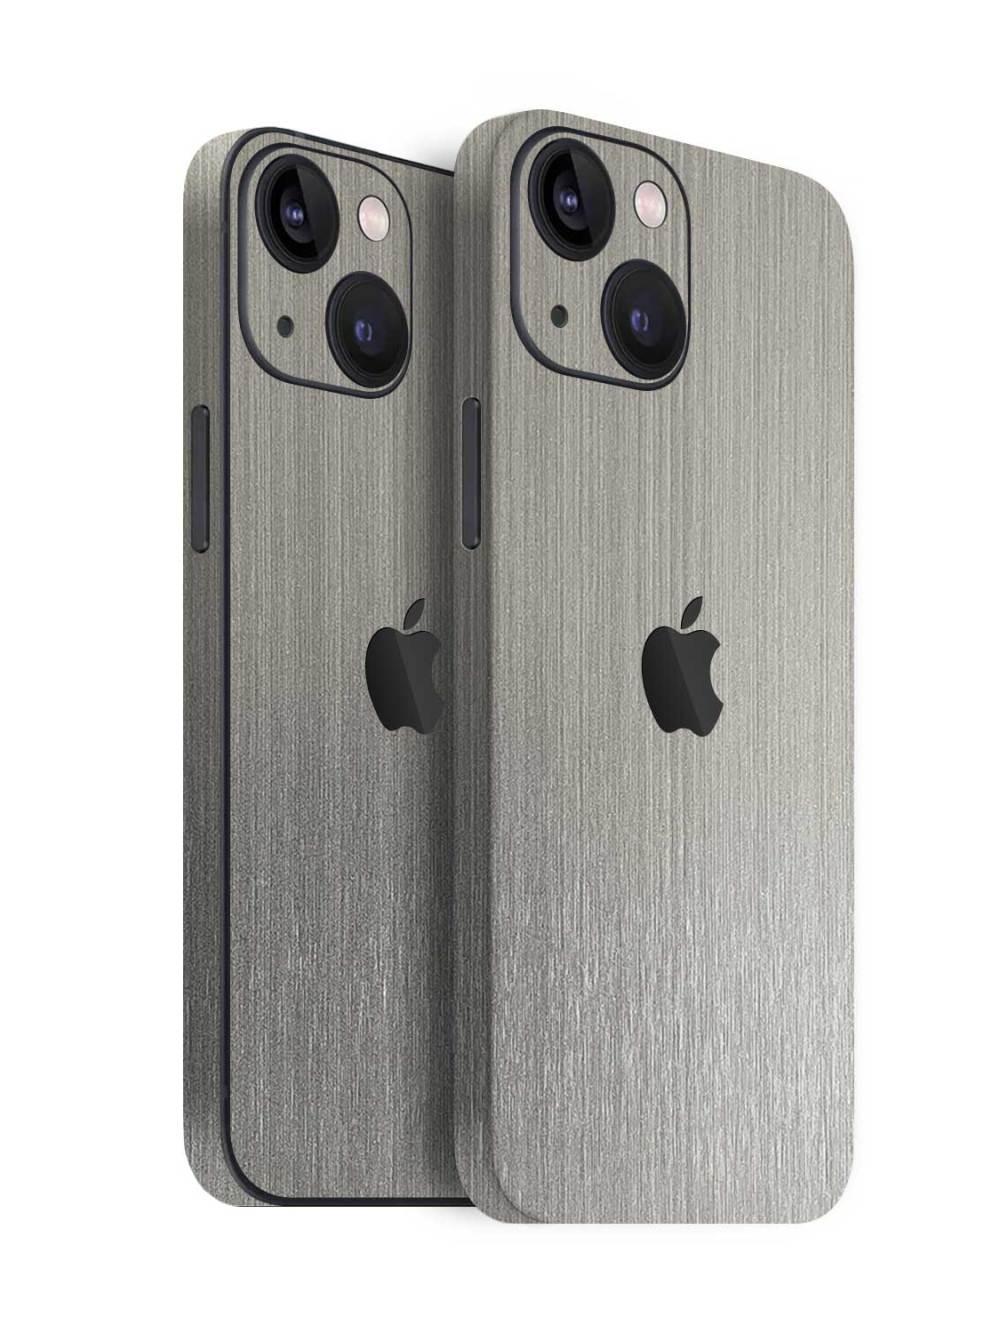 Apple iPhone 13 Skin Wrap